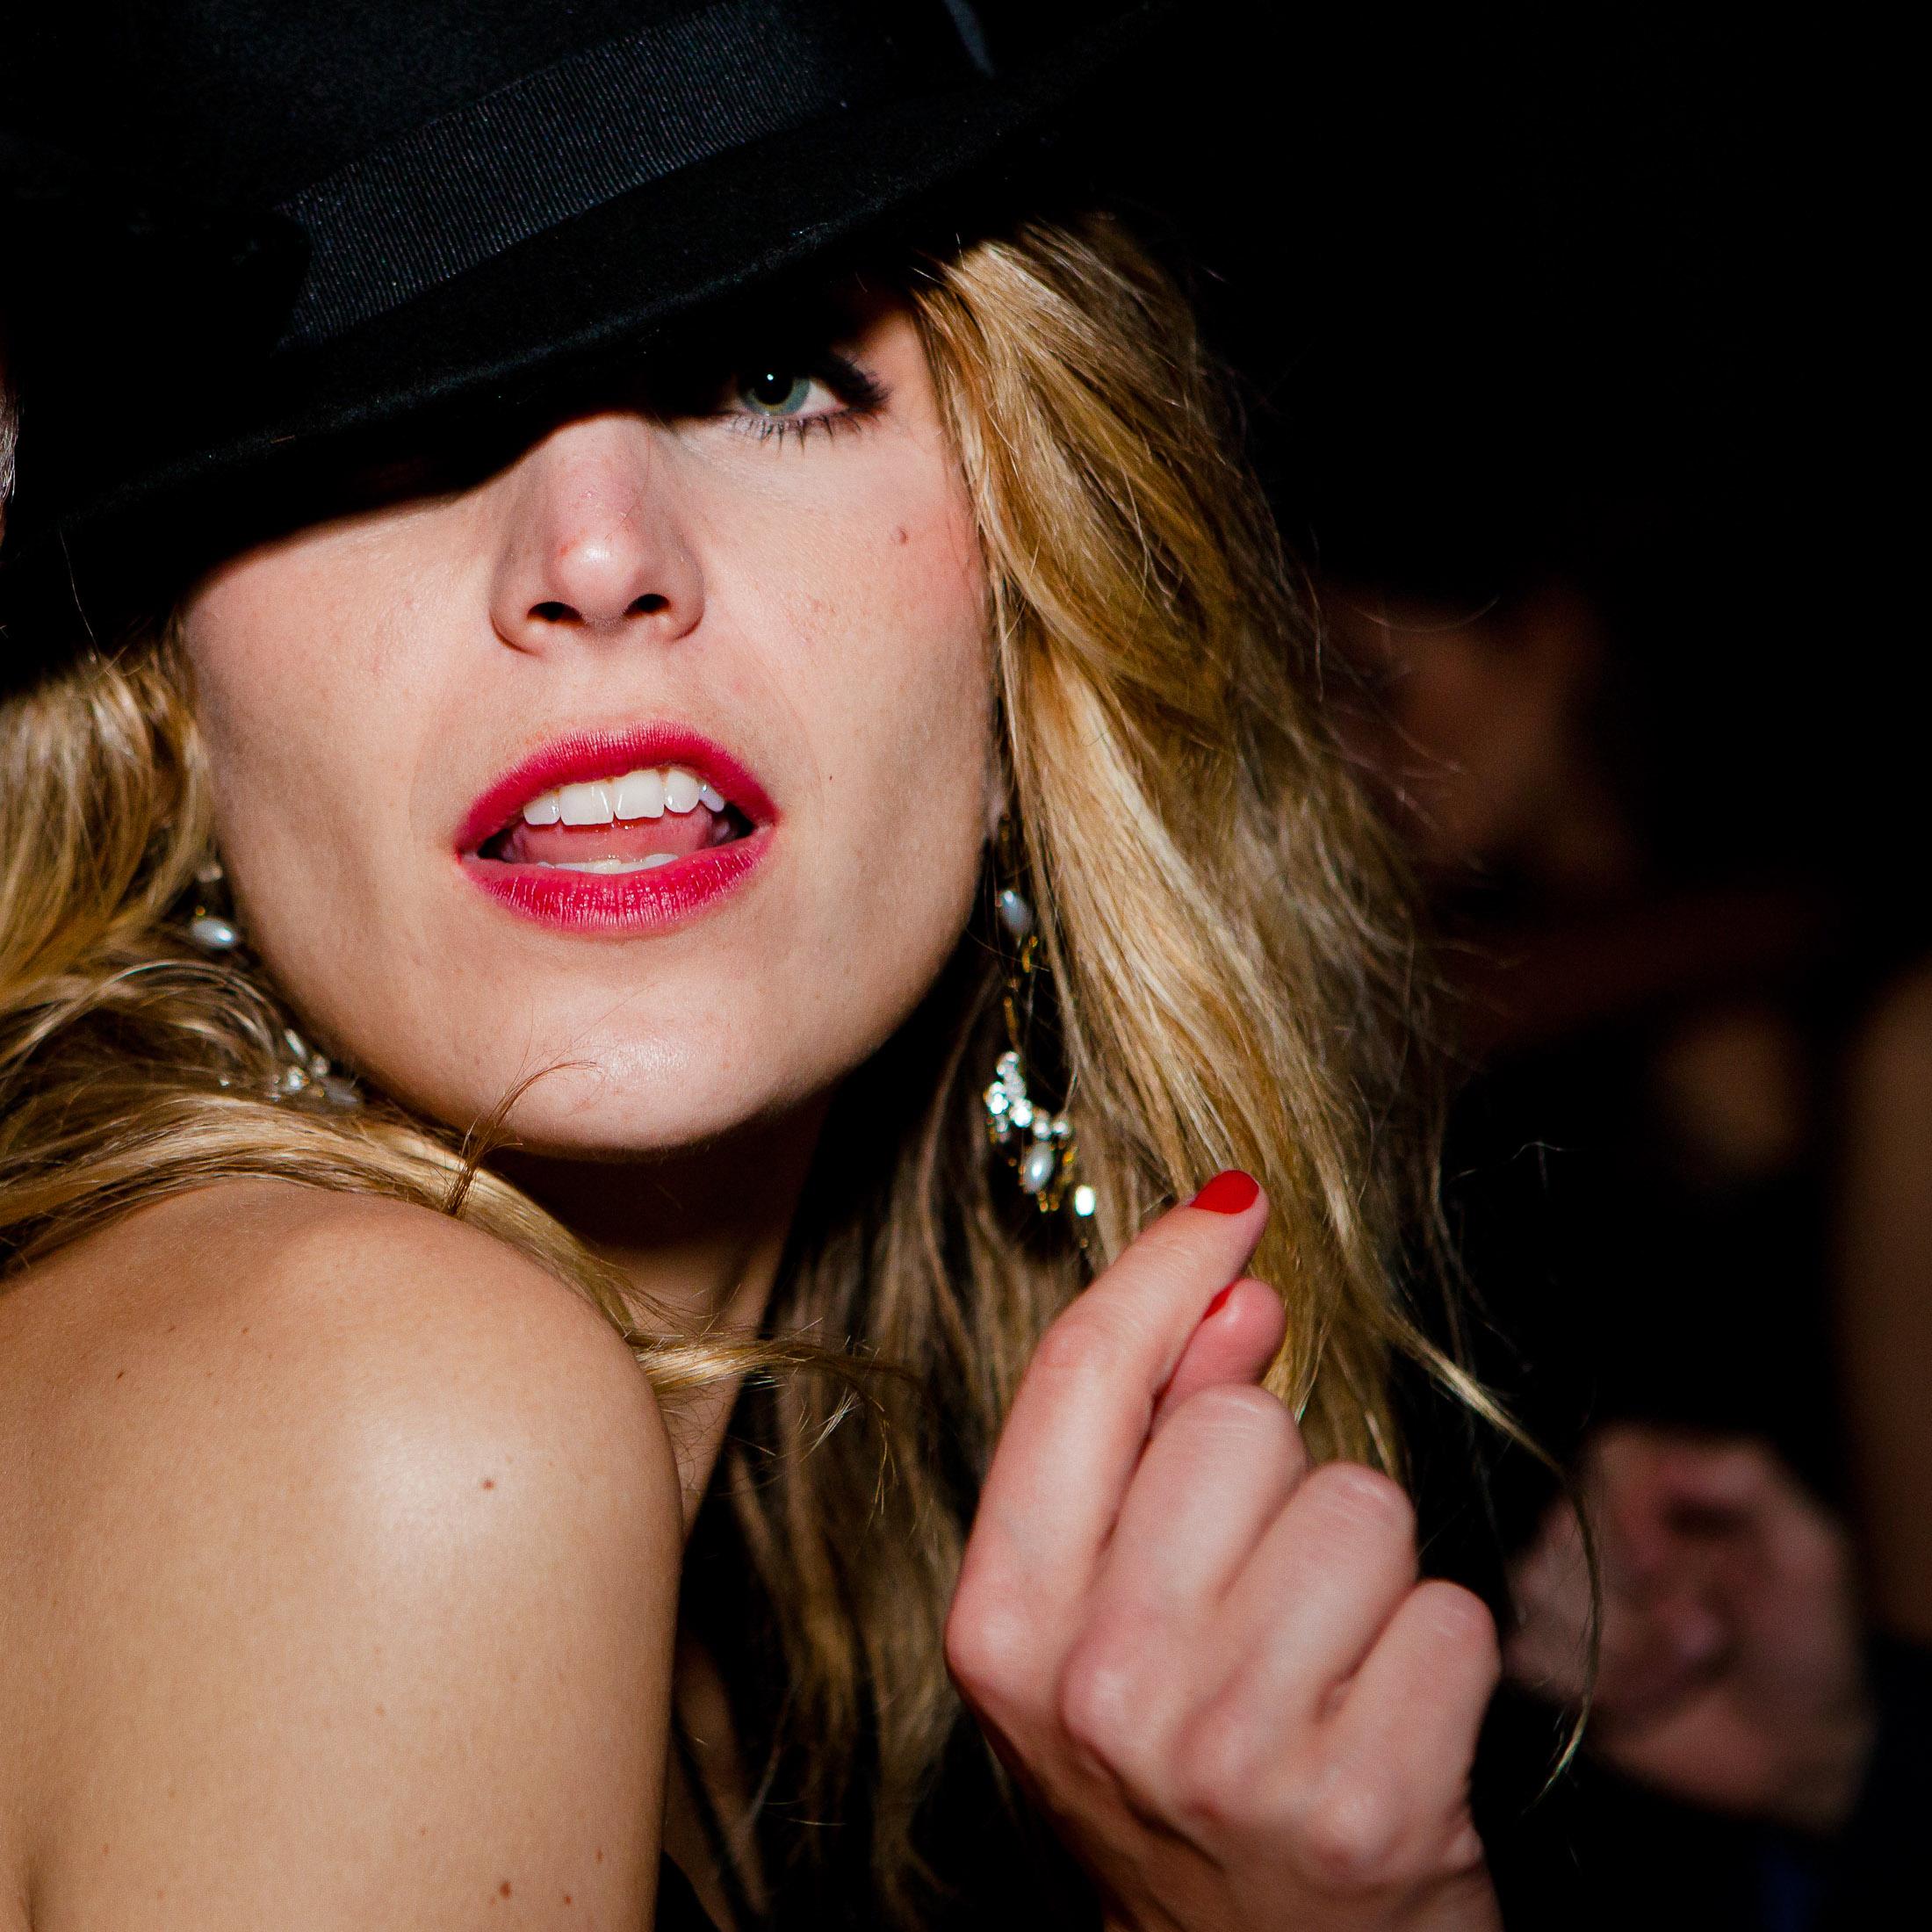 Rebecca-events-photographer-cannes-monaco08.jpg